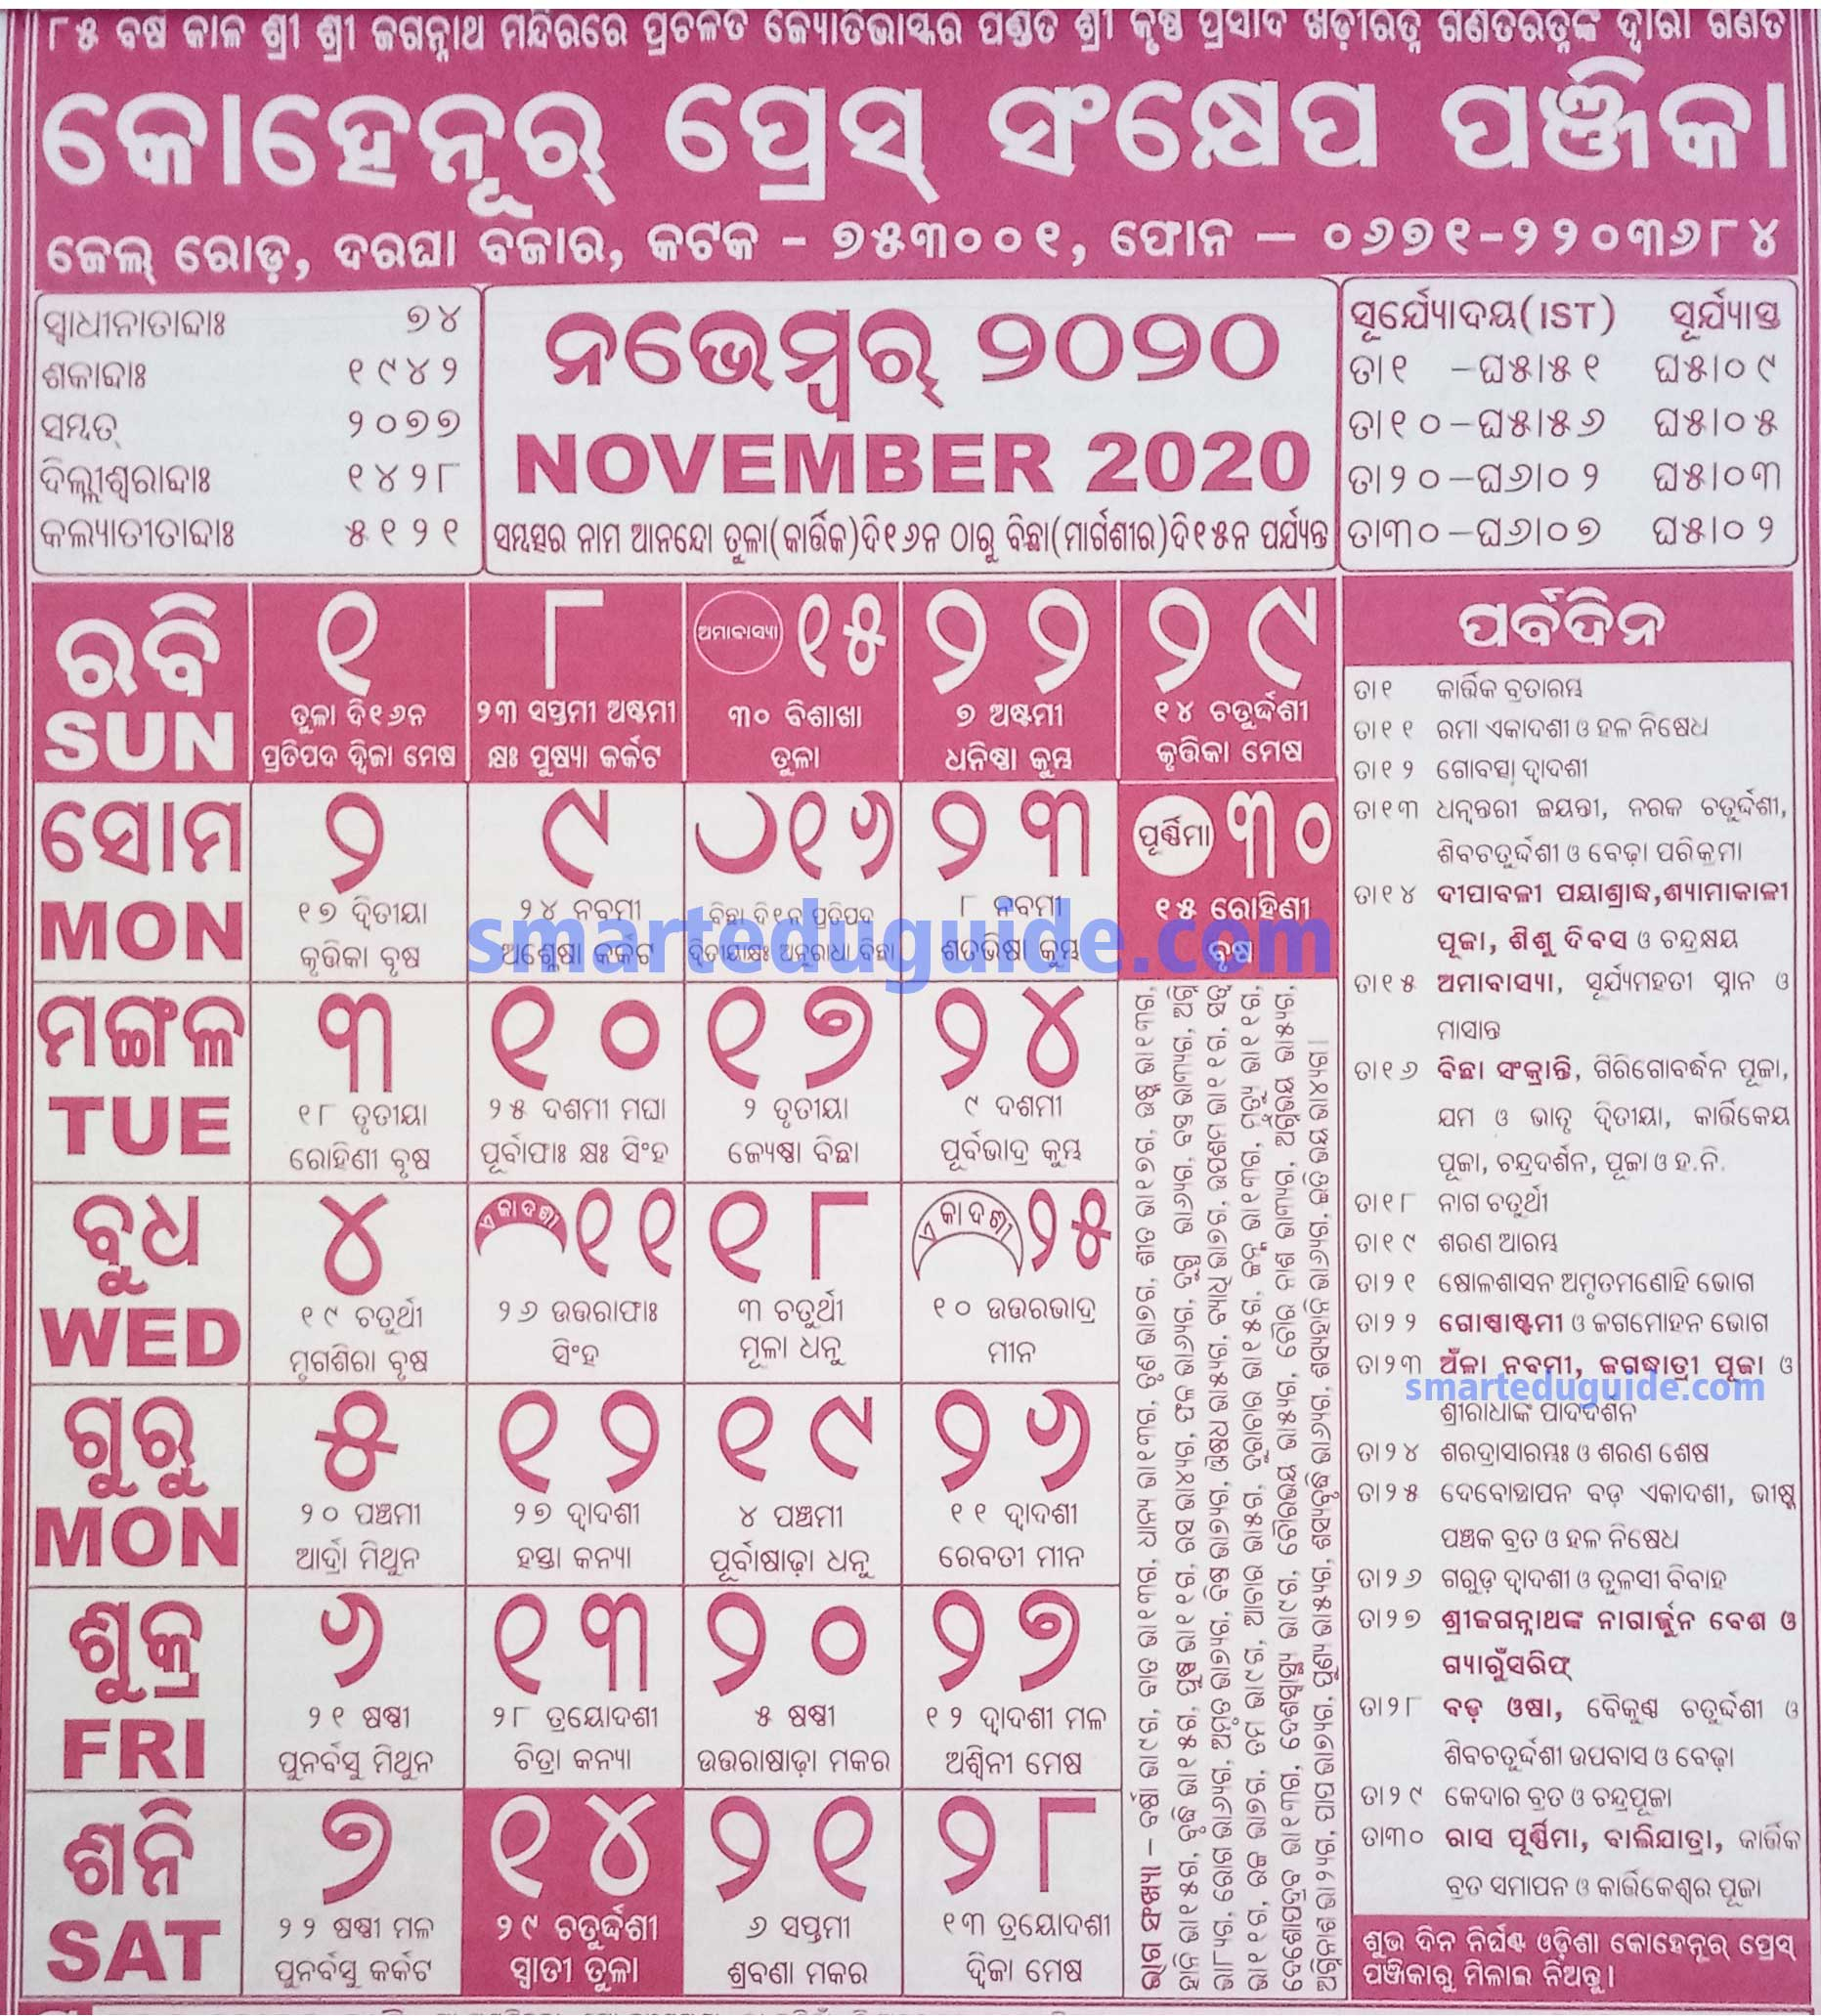 Odia Kohinoor Calendar 2020 November | Odishain inside Odia Calendar January 2020